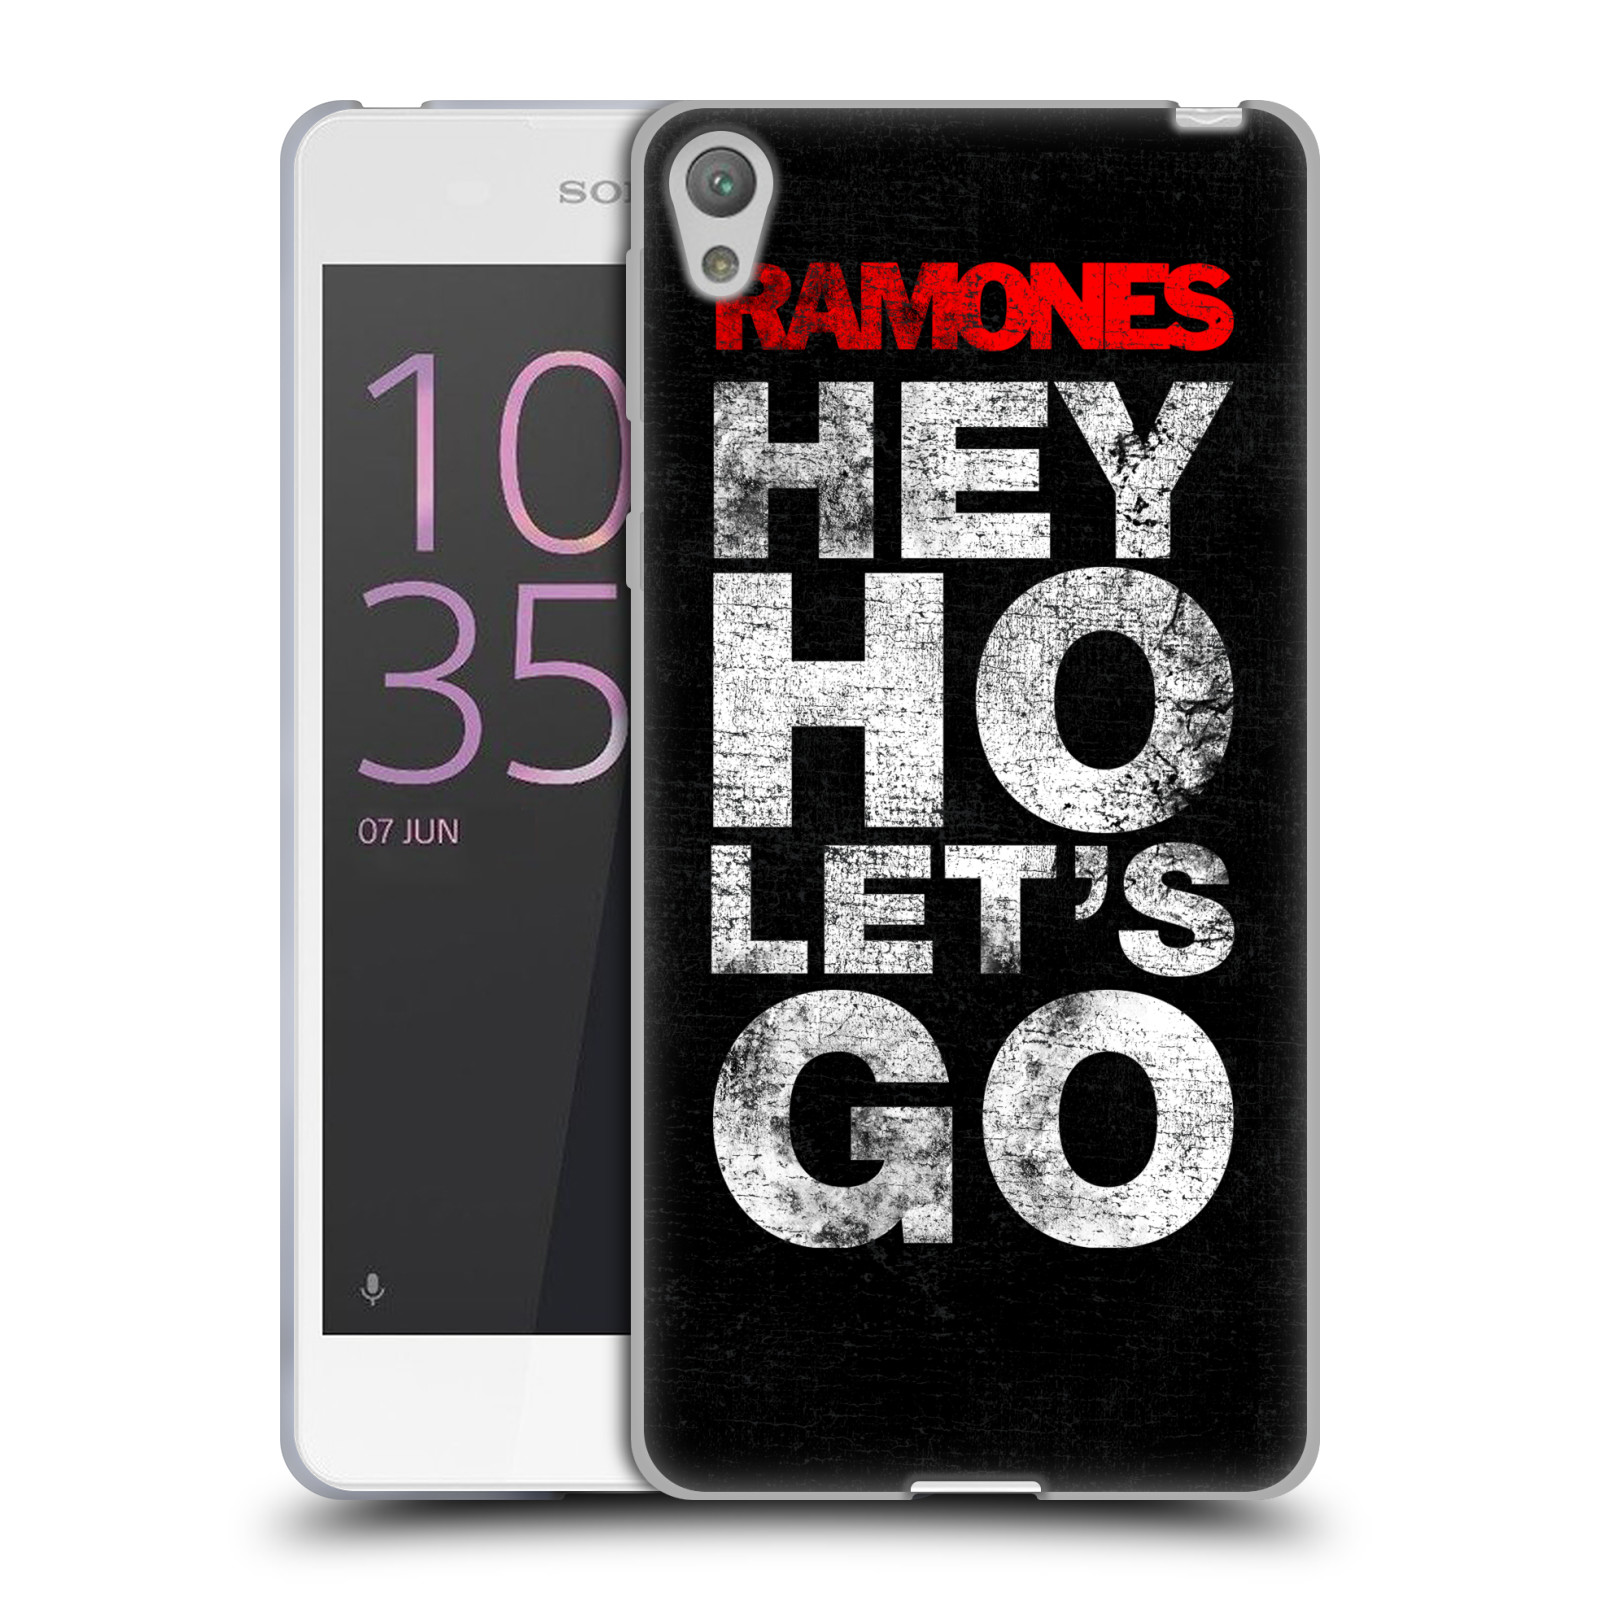 Silikonové pouzdro na mobil Sony Xperia E5 HEAD CASE The Ramones - HEY HO LET´S GO (Silikonový kryt či obal na mobilní telefon s oficiálním licencovaným motivem The Ramones pro Sony Xperia E5 F3311)